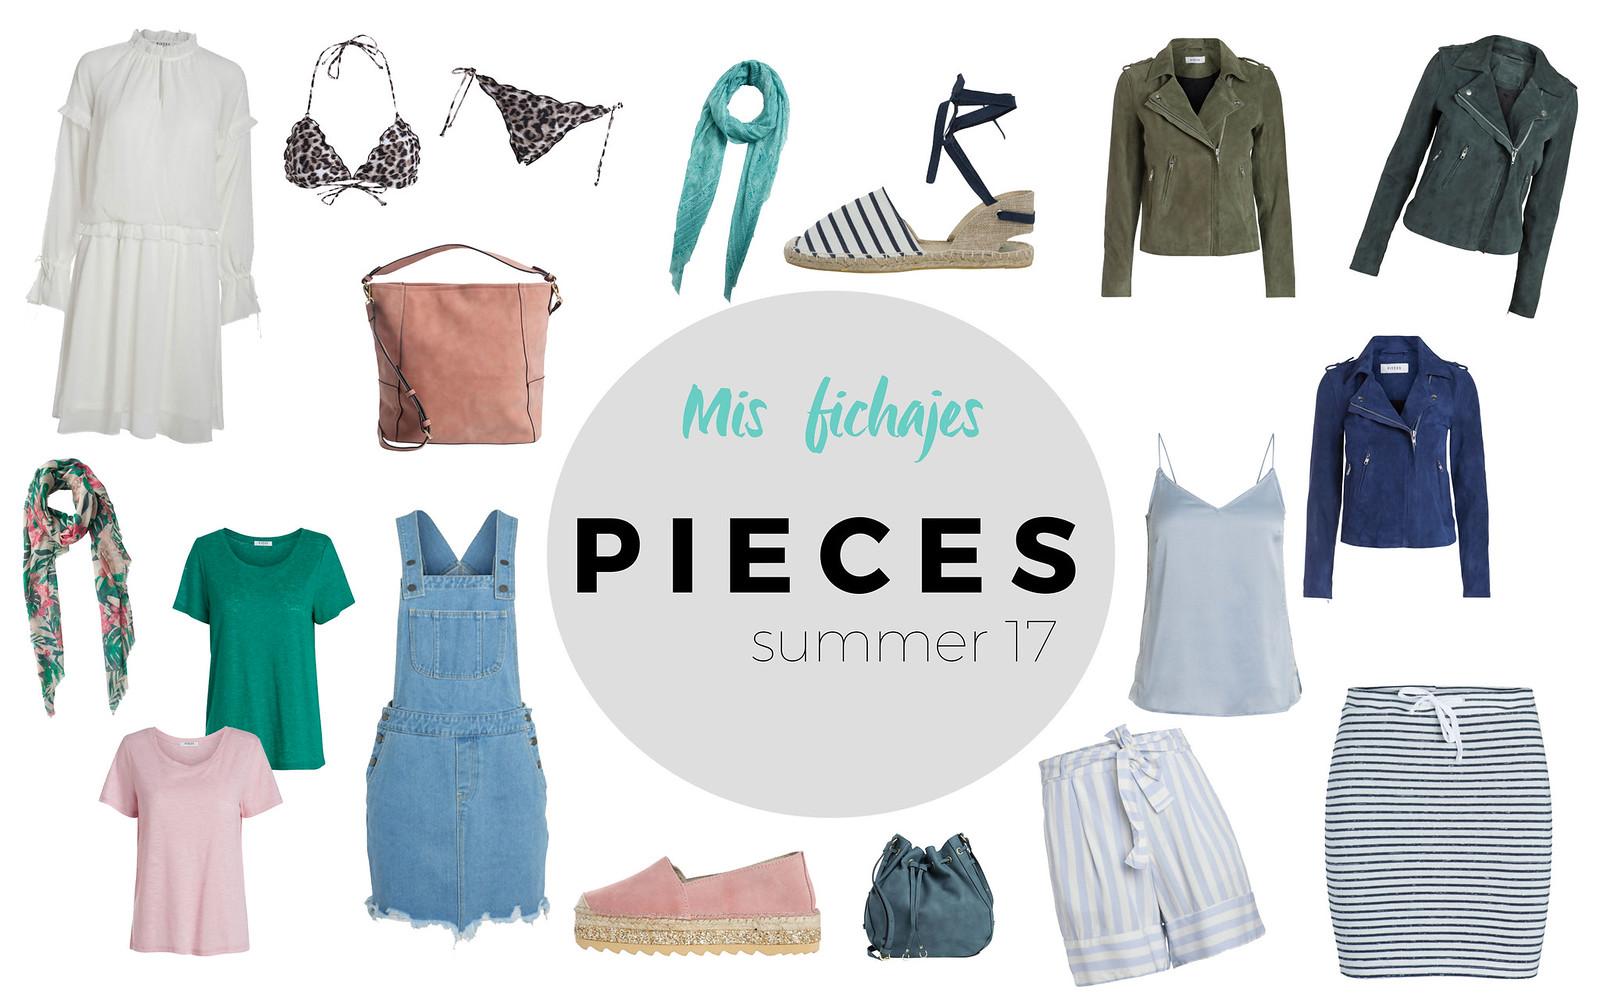 piecesfichajes